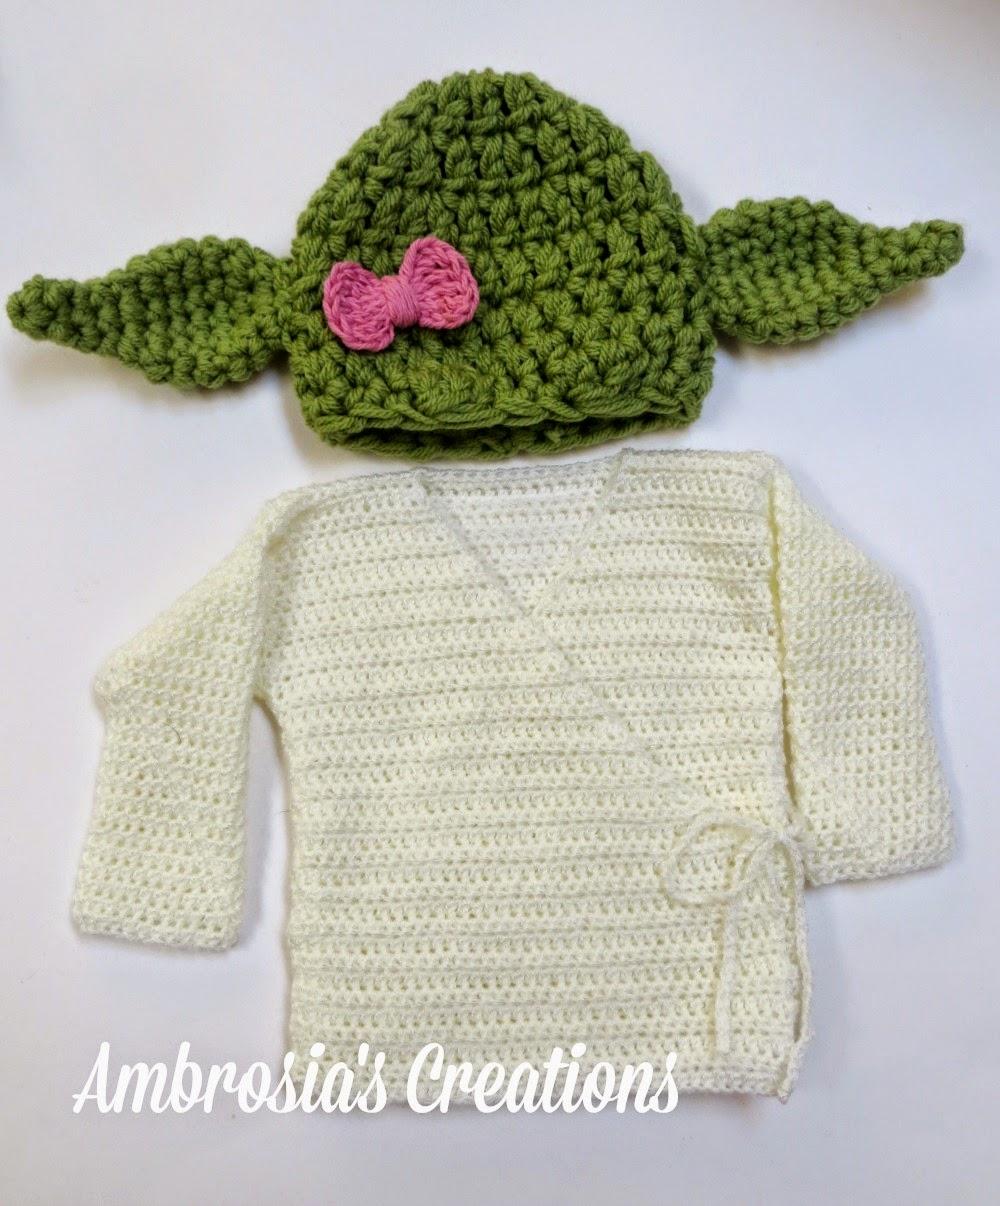 Ambrosia\'s Creations